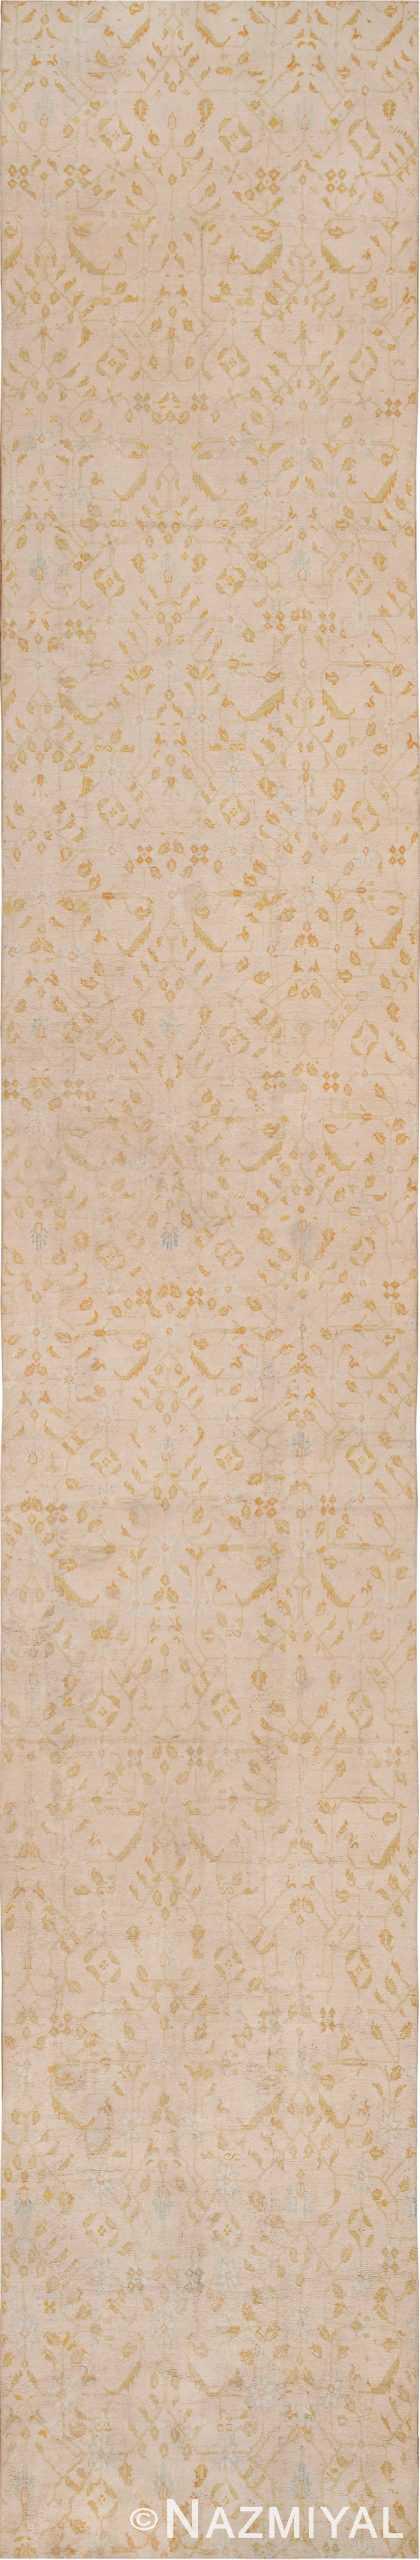 Long and Narrow Ivory Antique Indian Agra Runner Rug 49752 - Nazmiyal